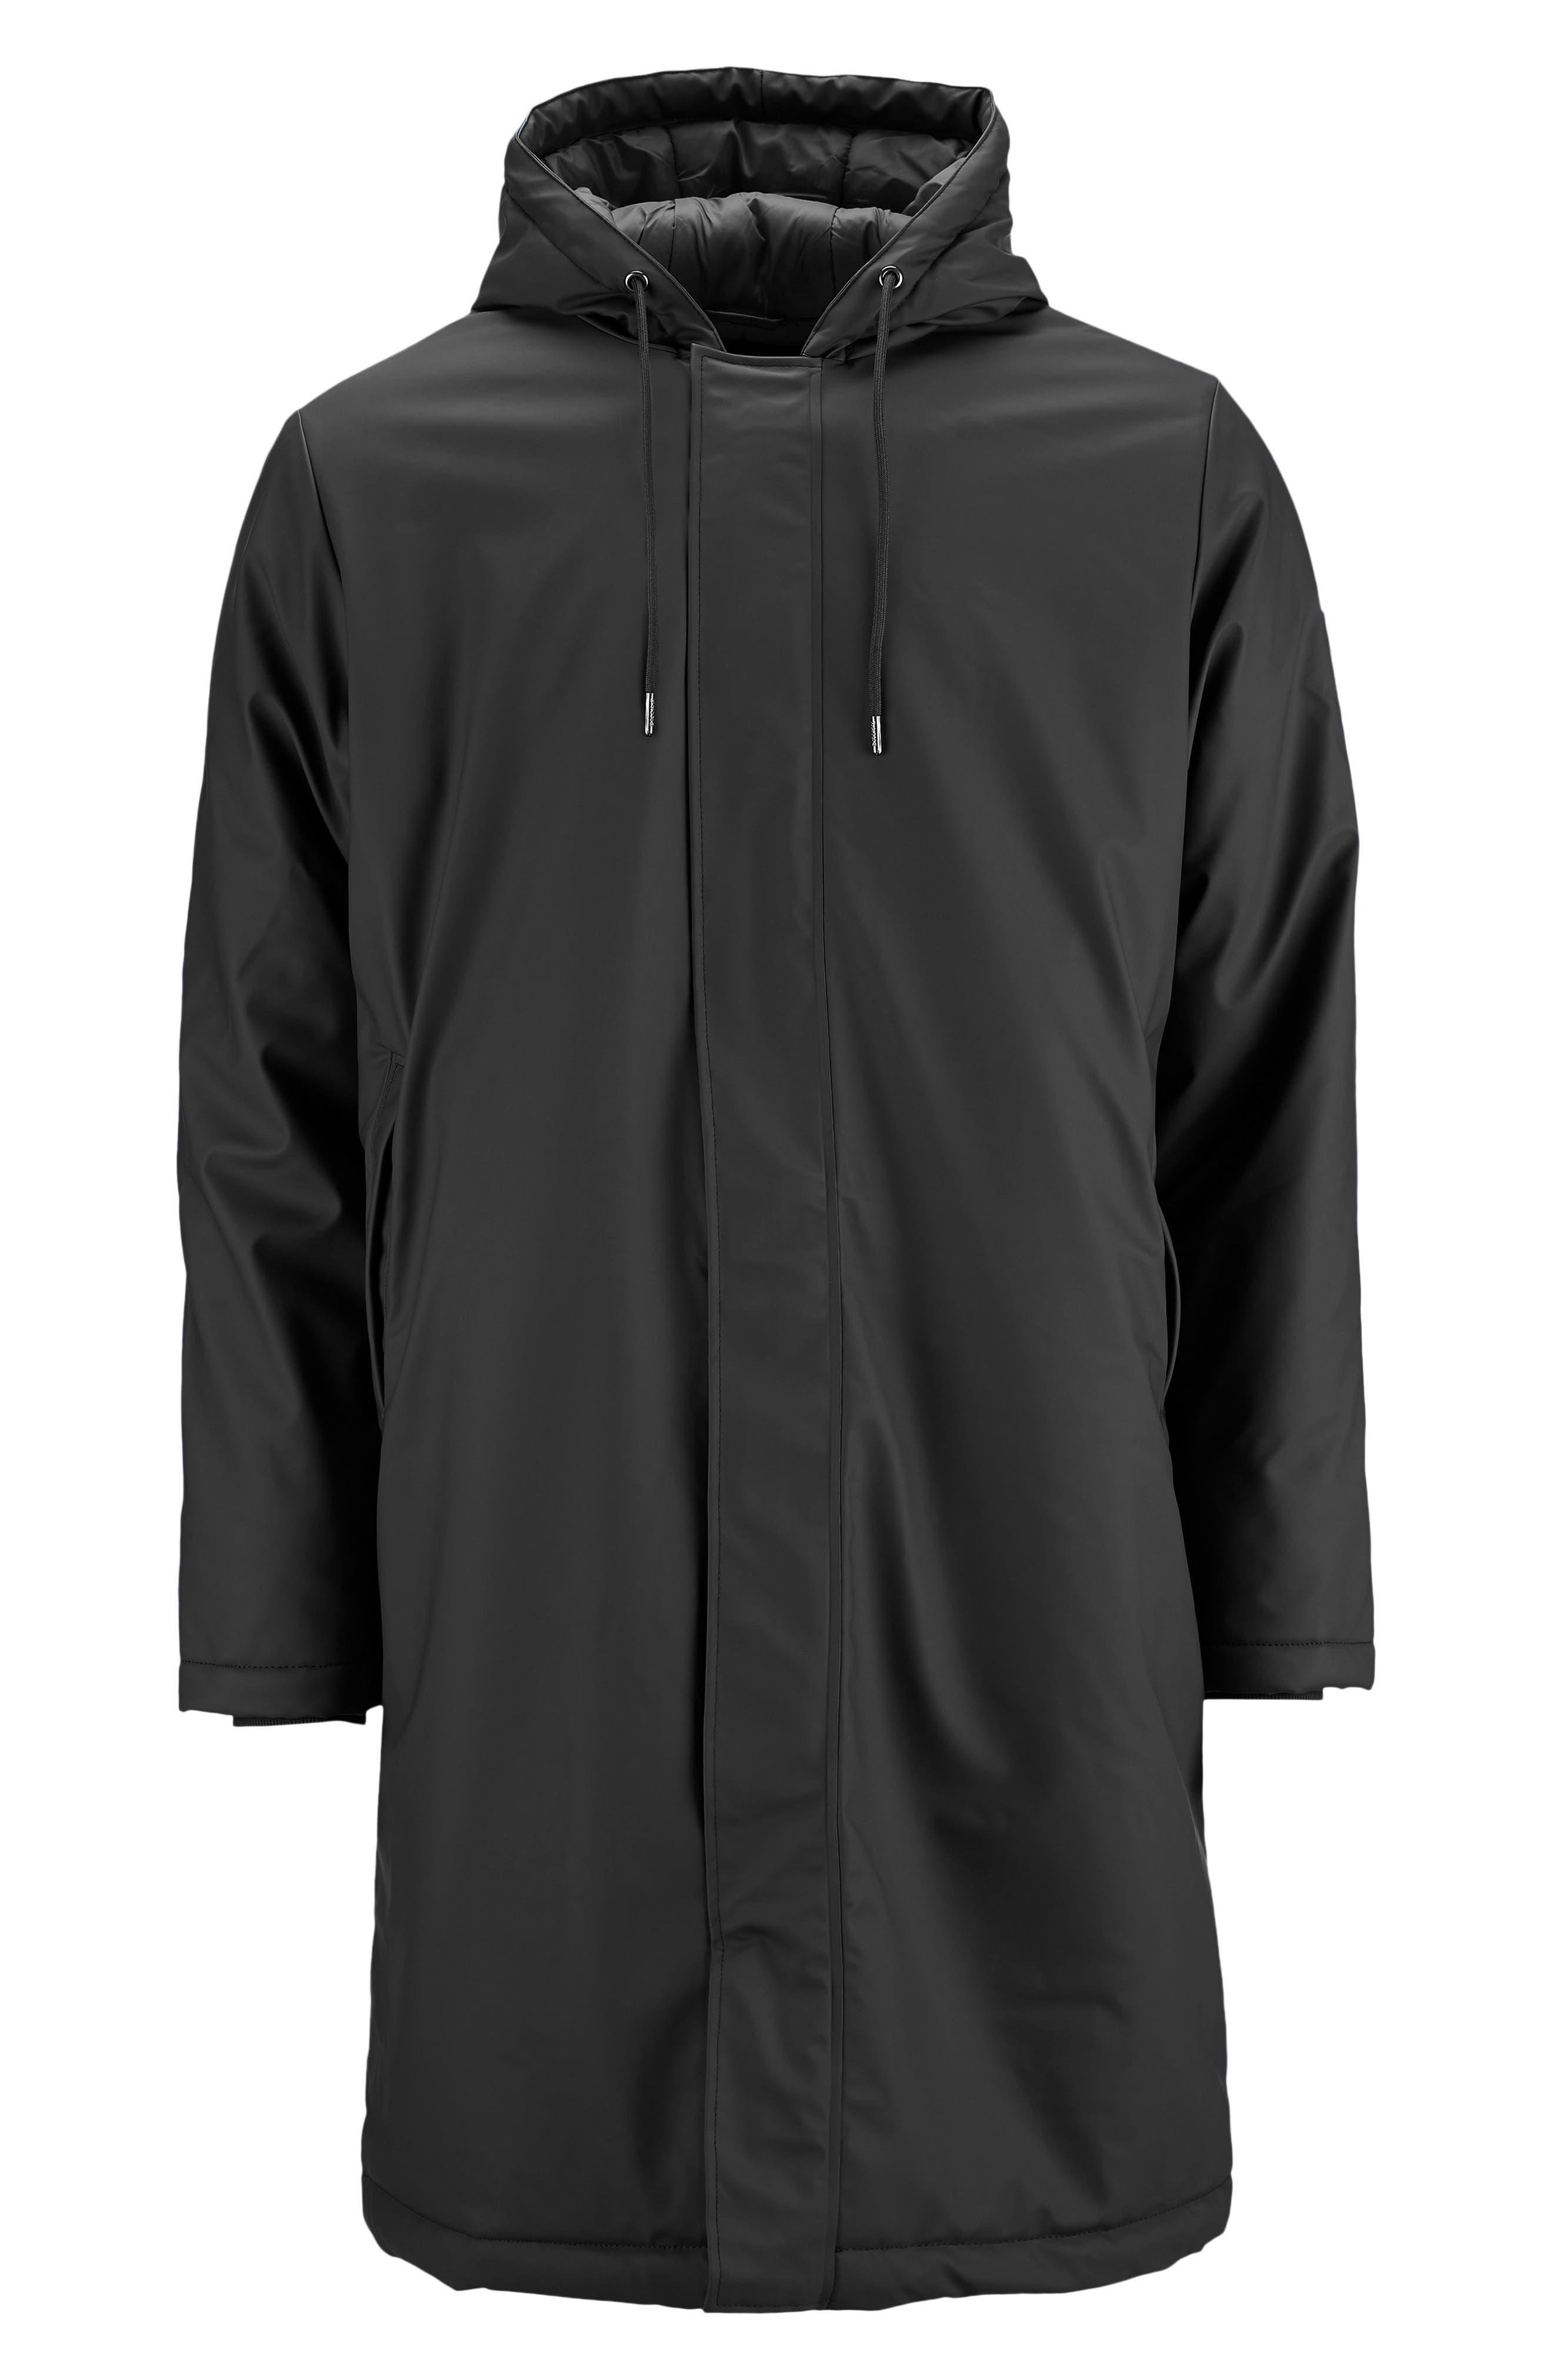 Thermal Hooded Raincoat,                             Alternate thumbnail 6, color,                             BLACK